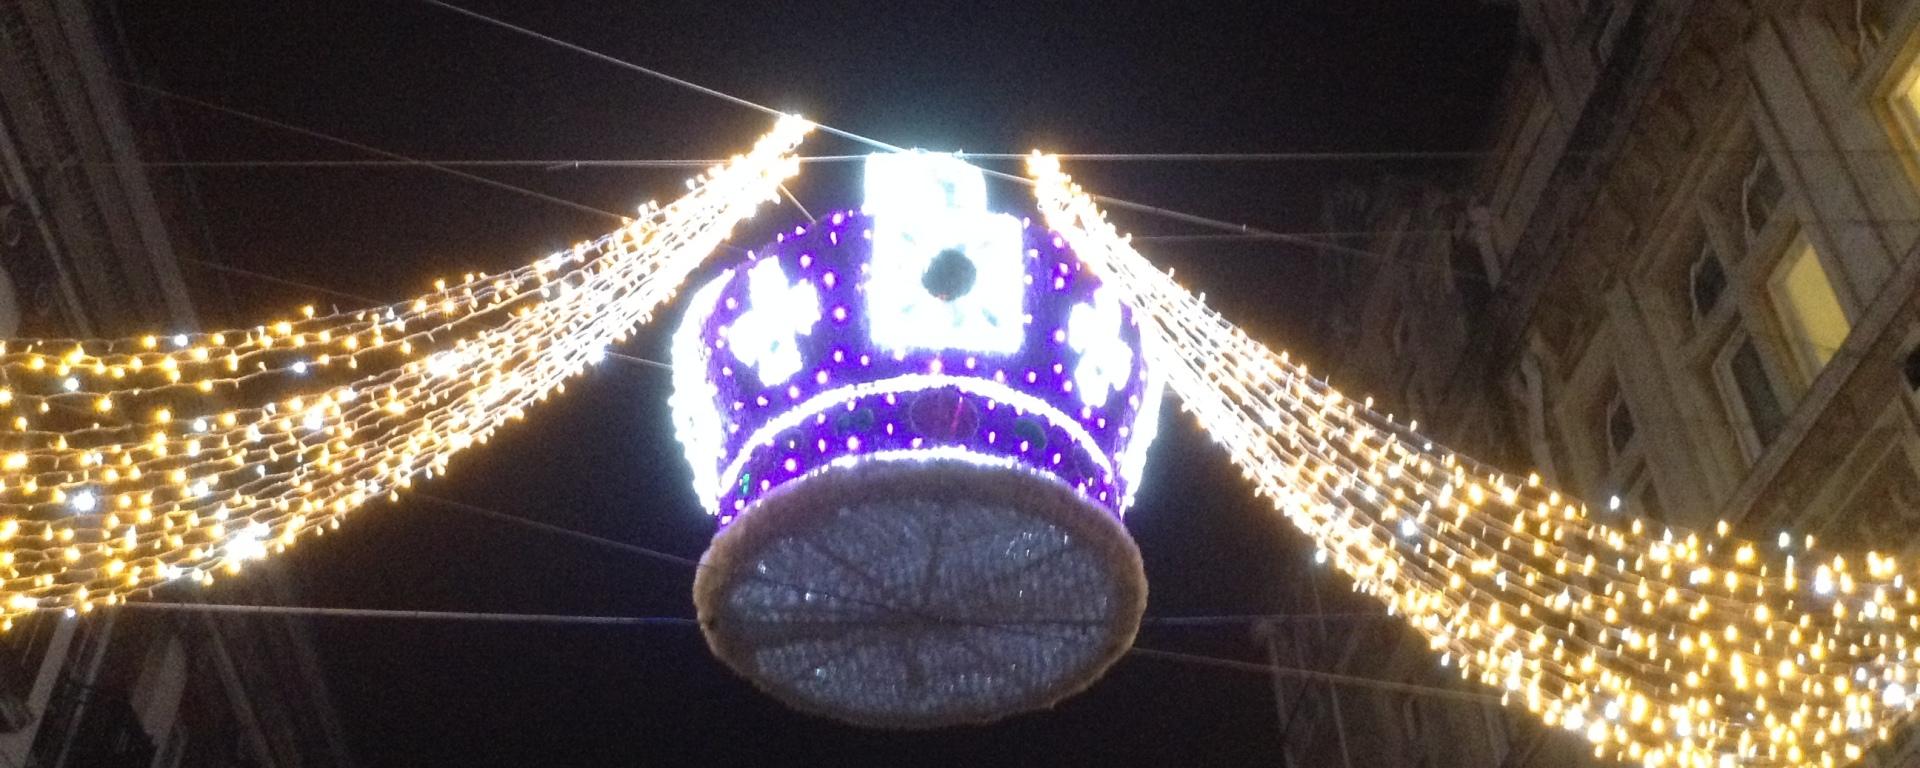 windsors crown jewels